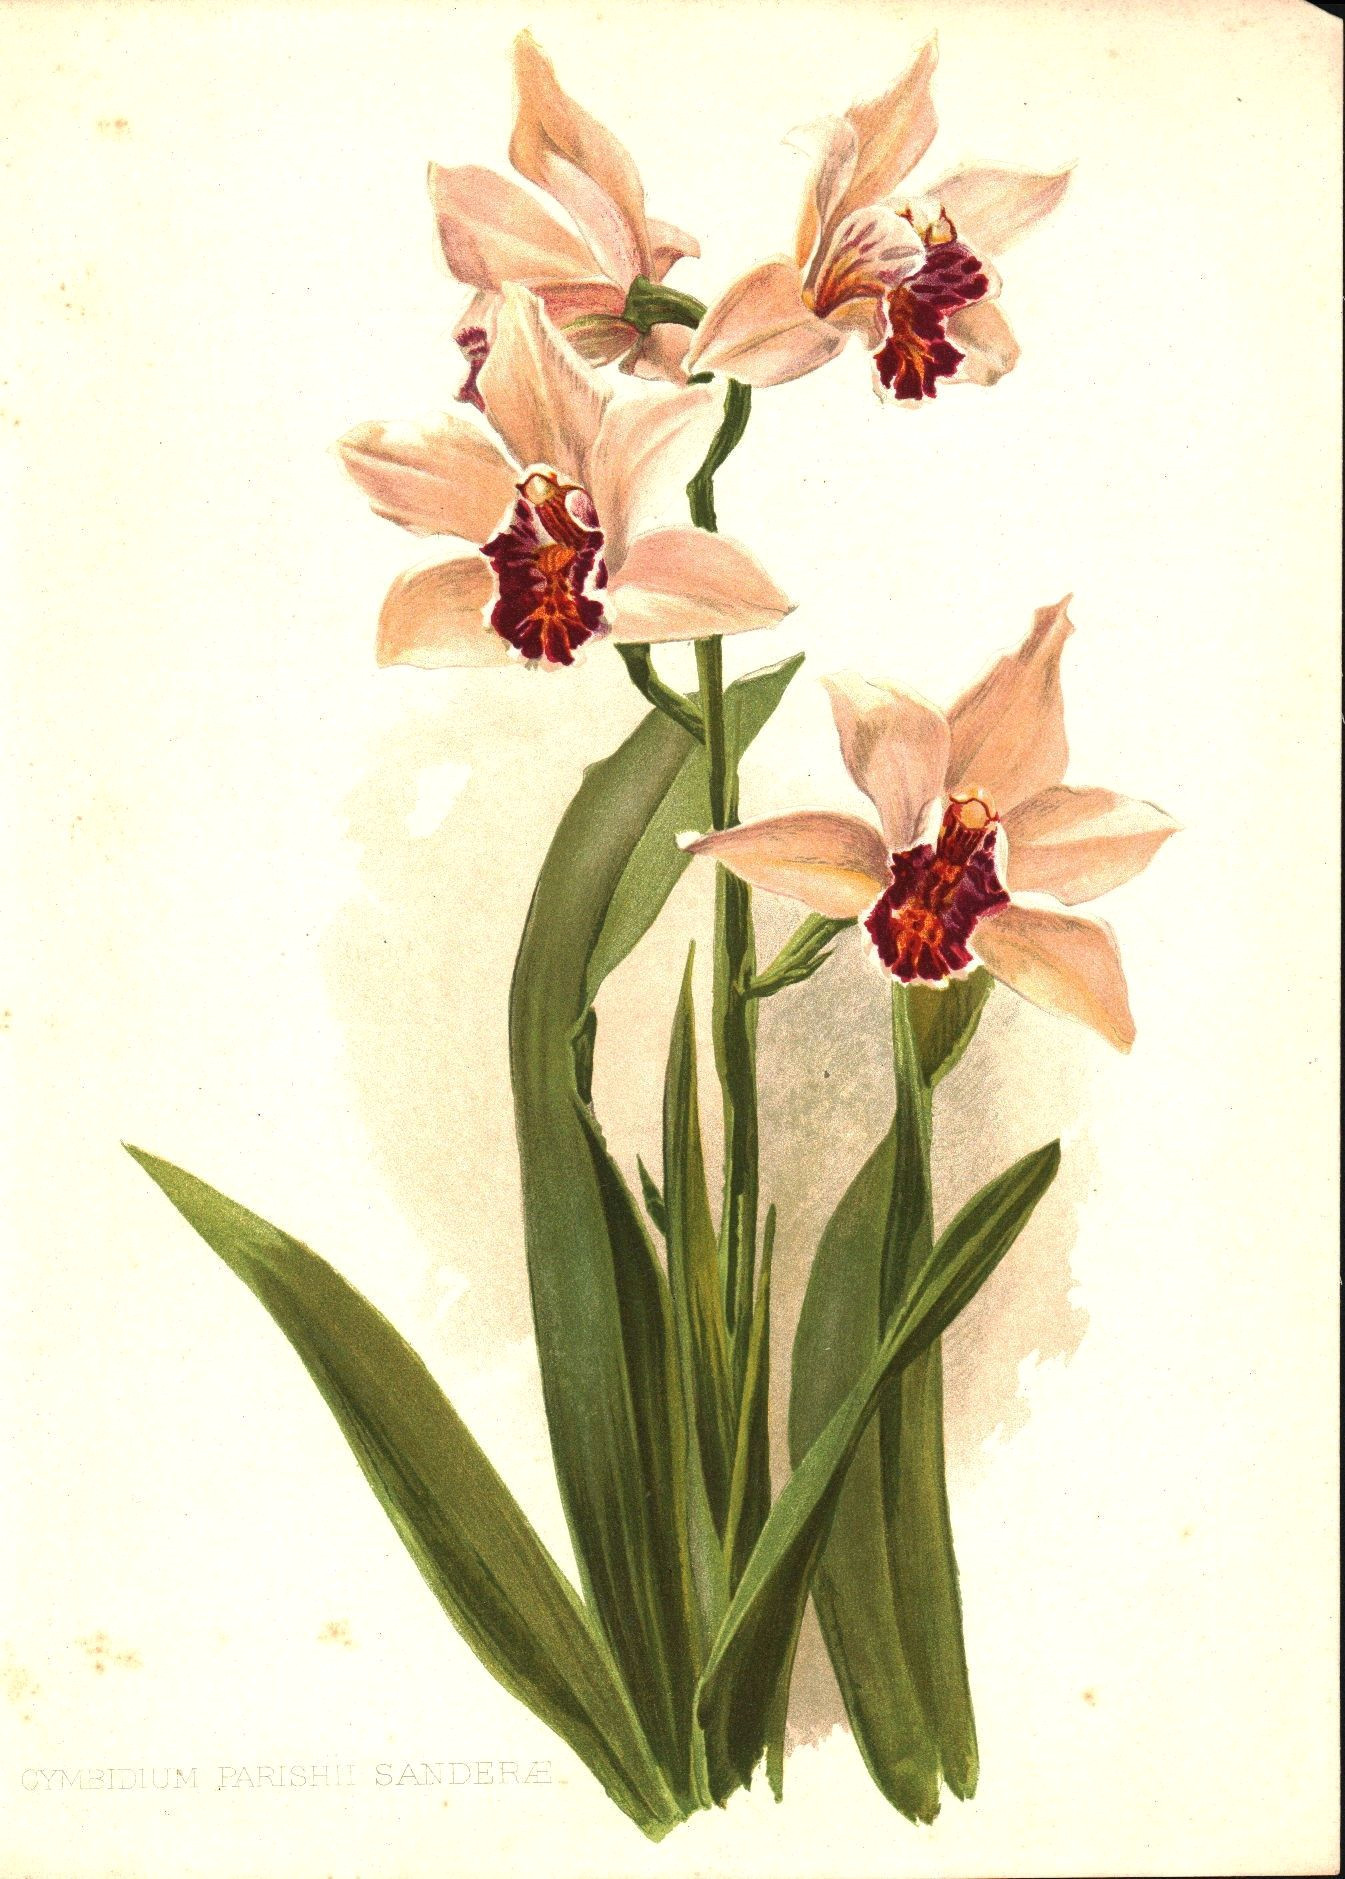 sander s cymbidium orchid 1905 henry moon botanical flower print